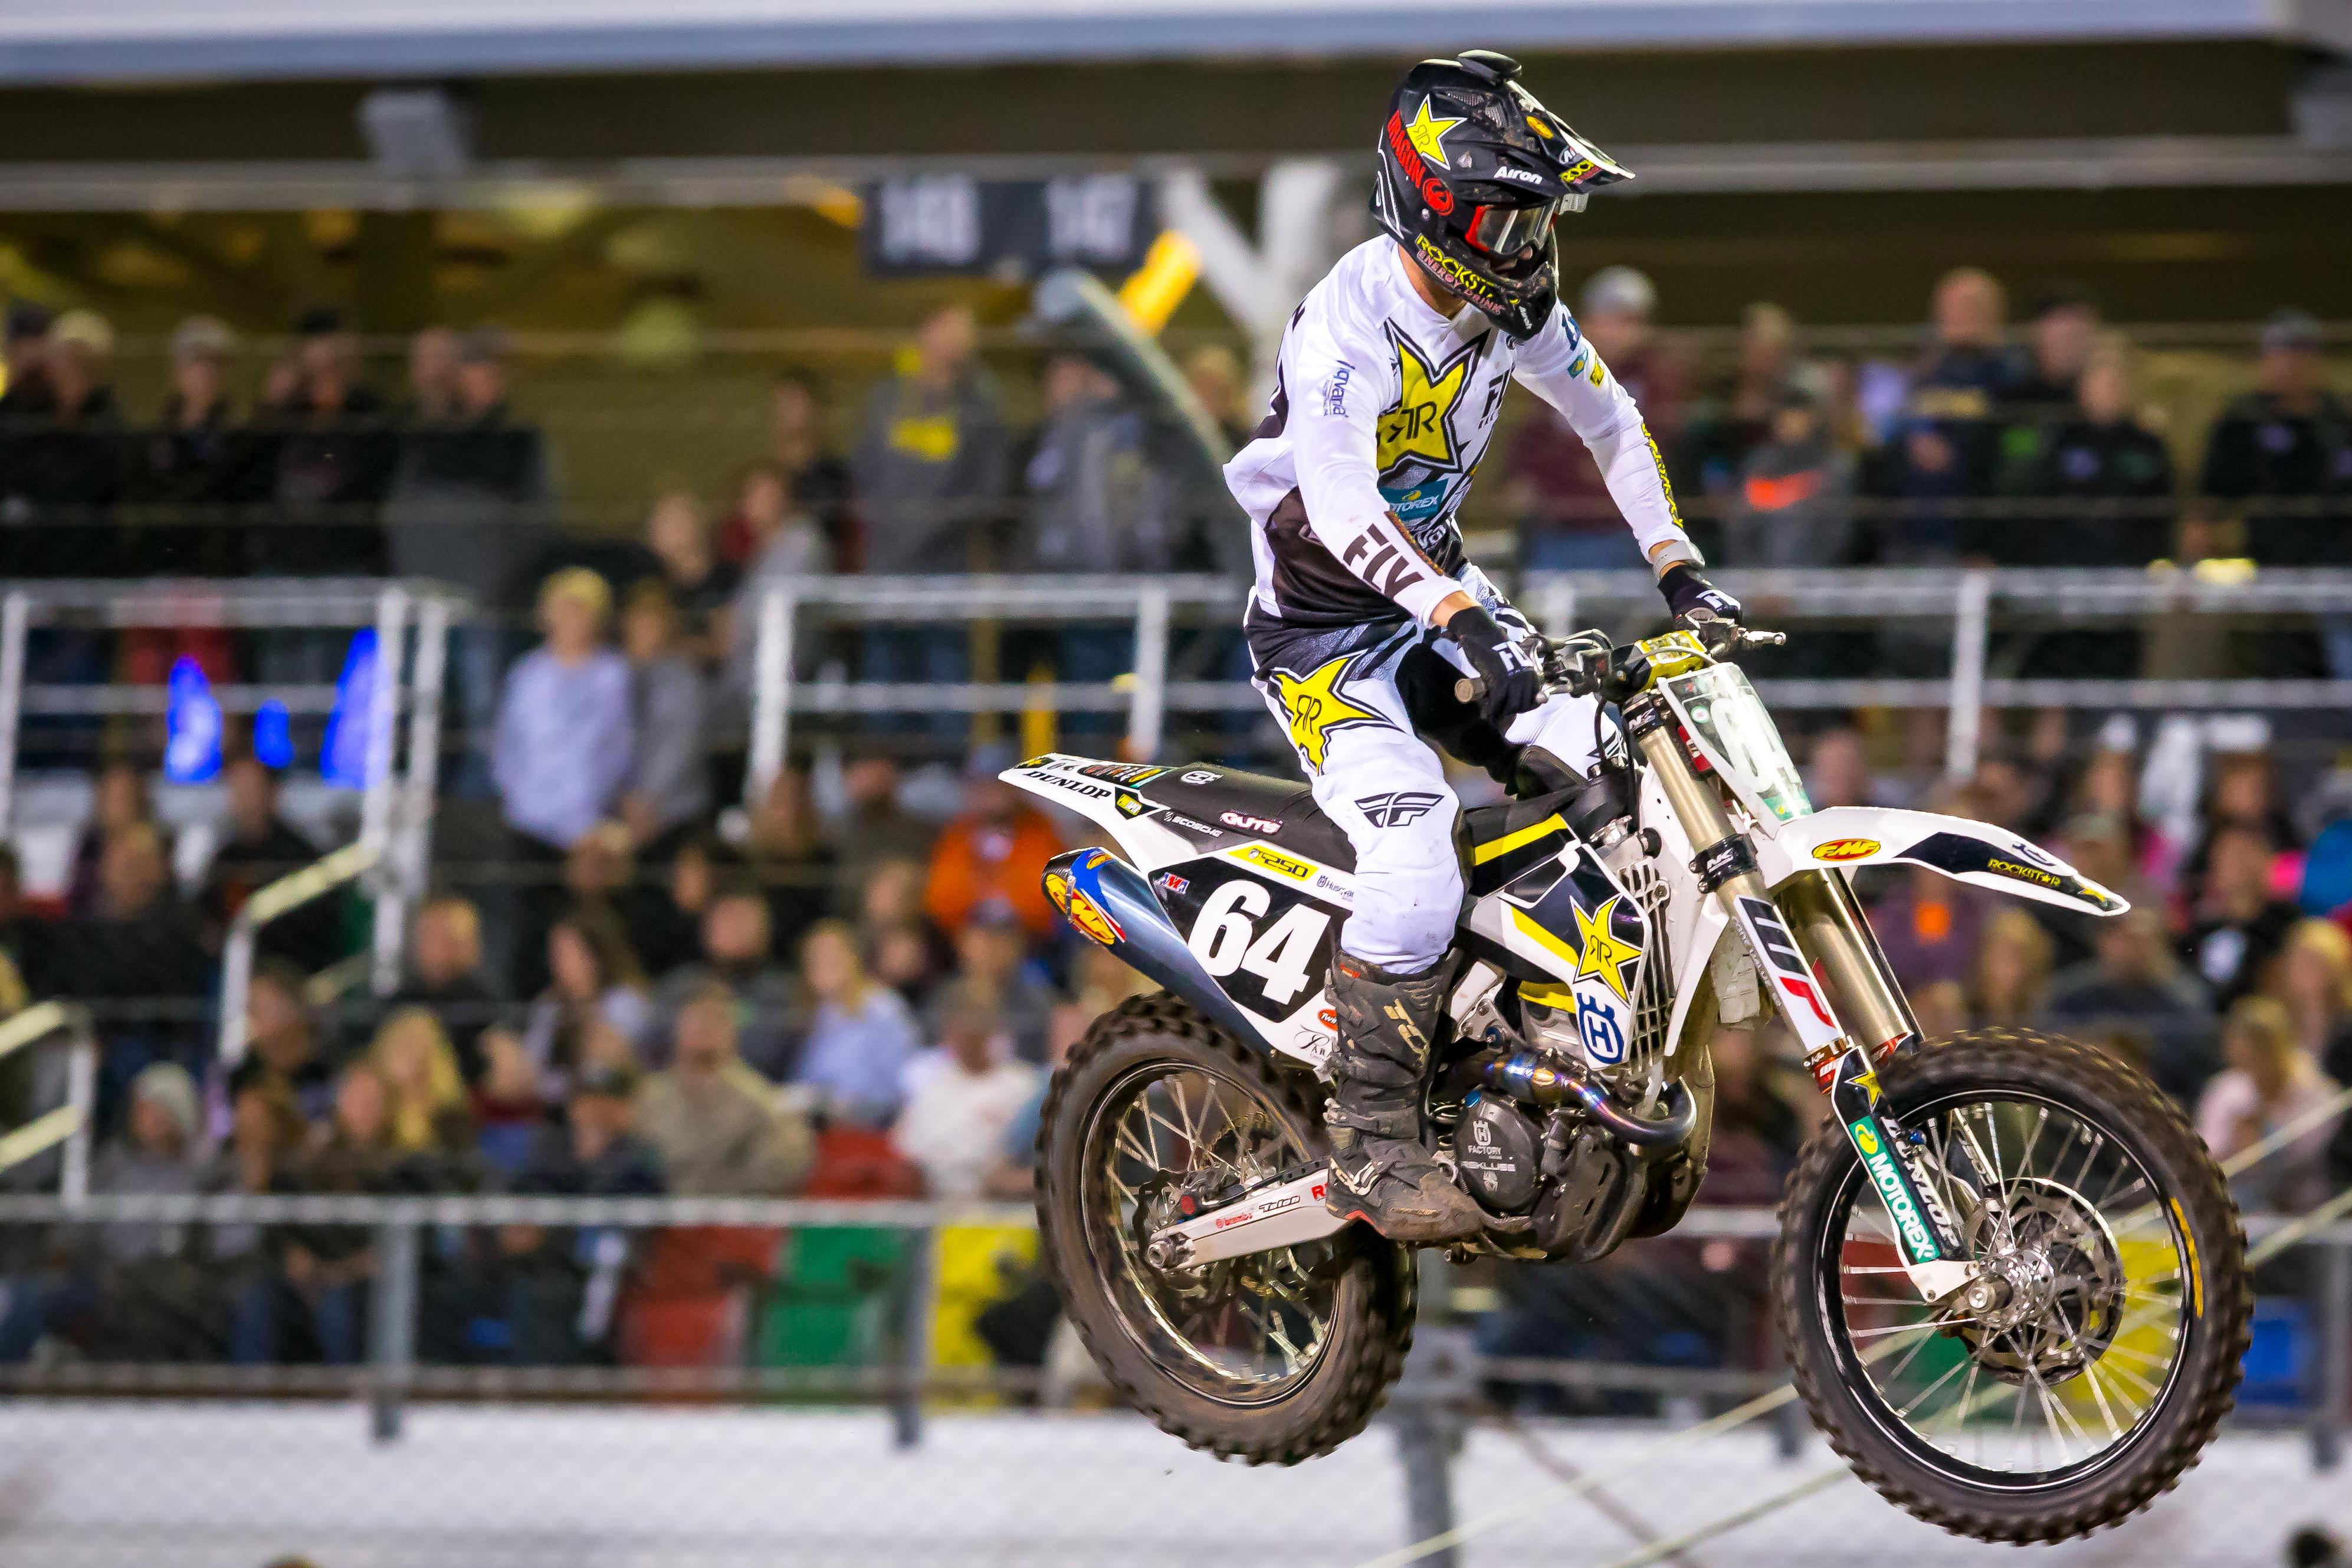 Daytons Supercross - Michael Mosiman